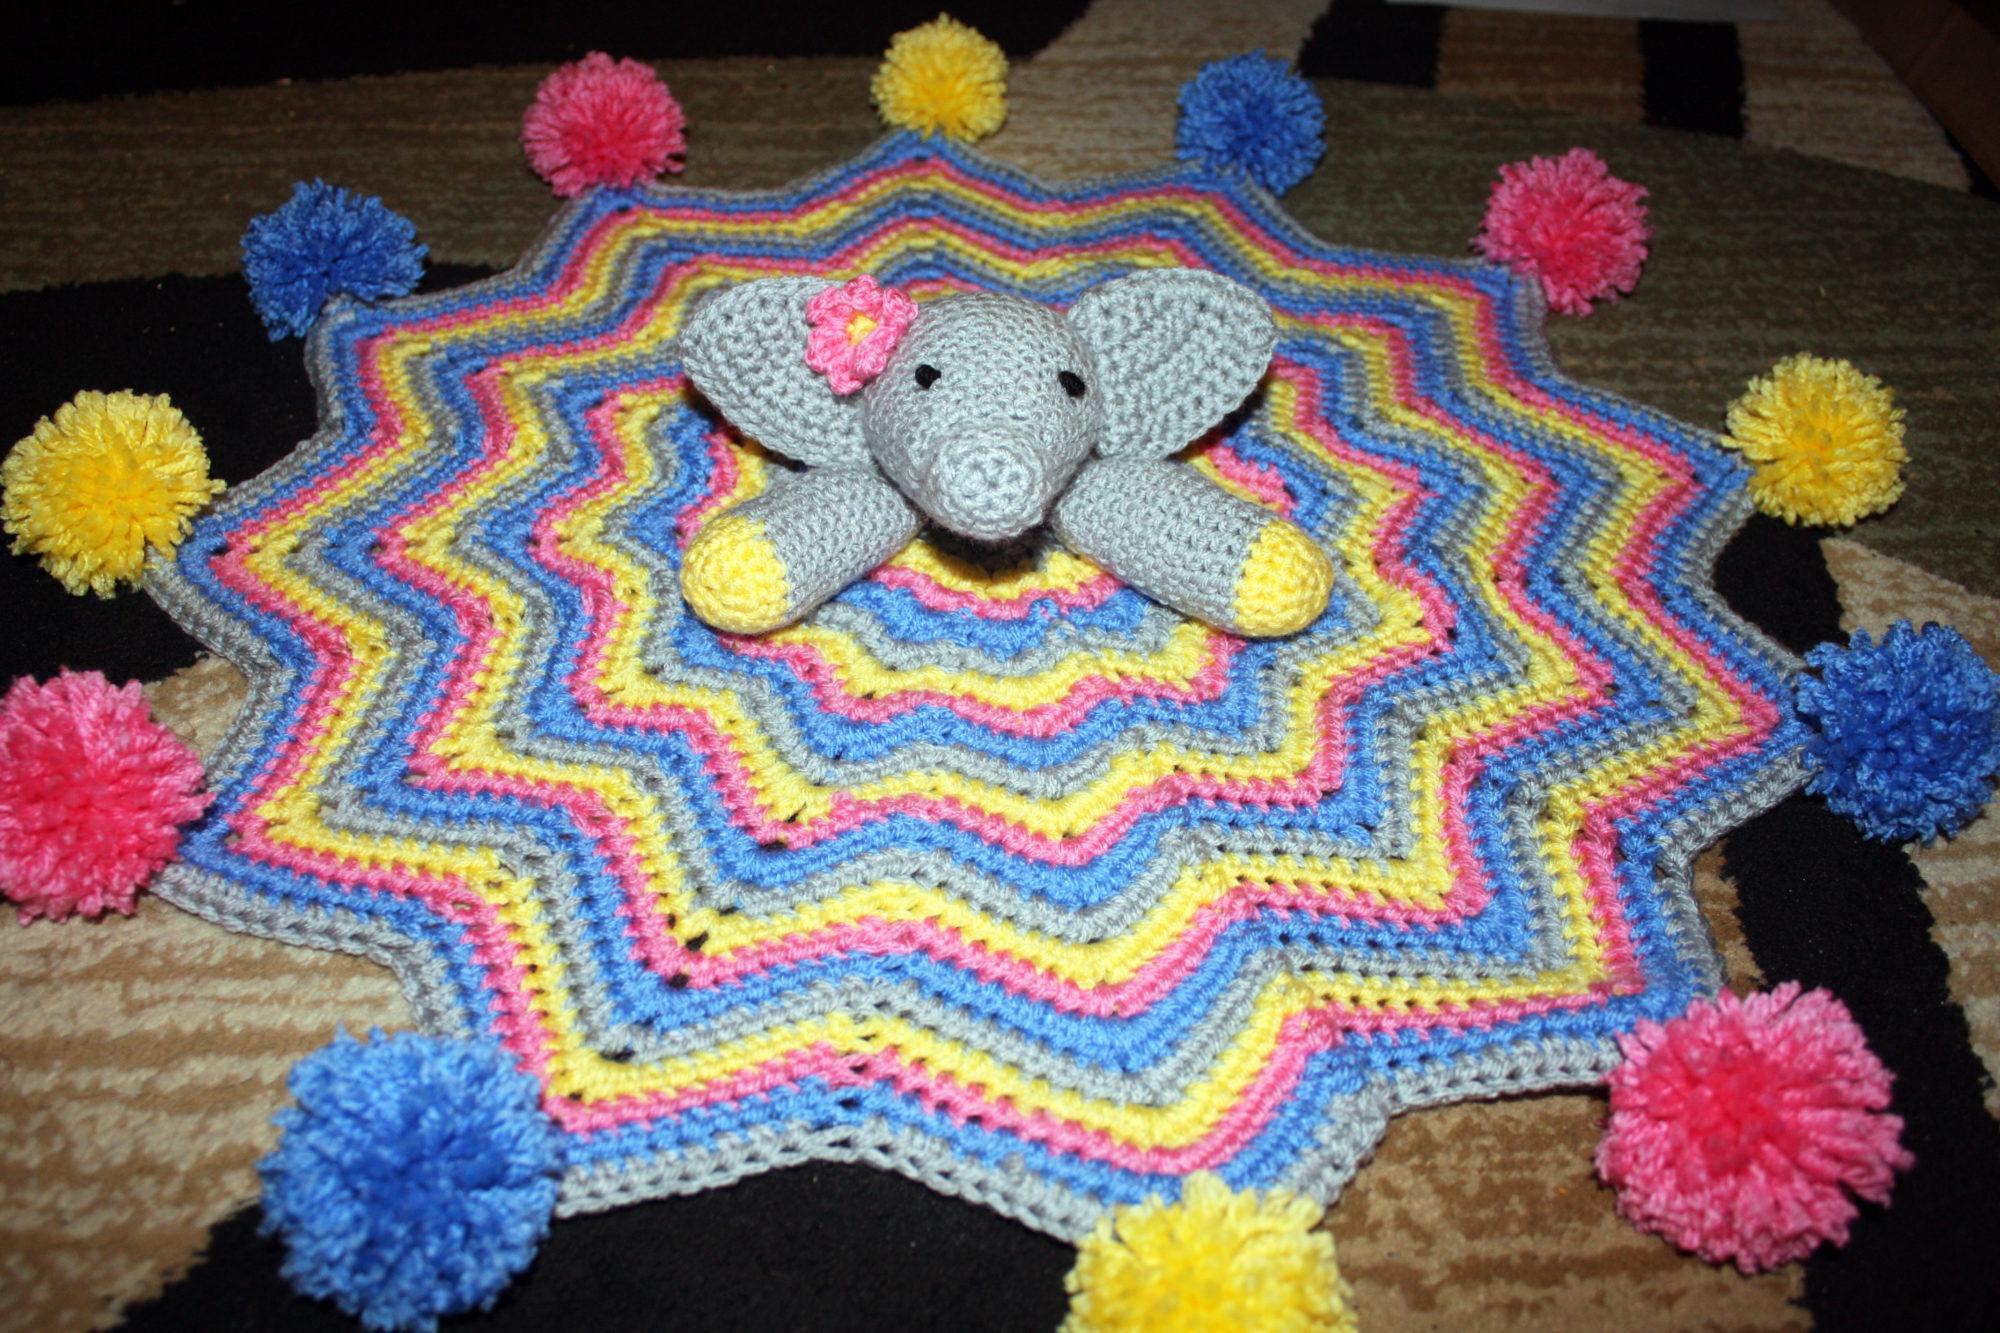 Elephant Crochet Lovey An Awesome Baby Crochet Pattern Stacys